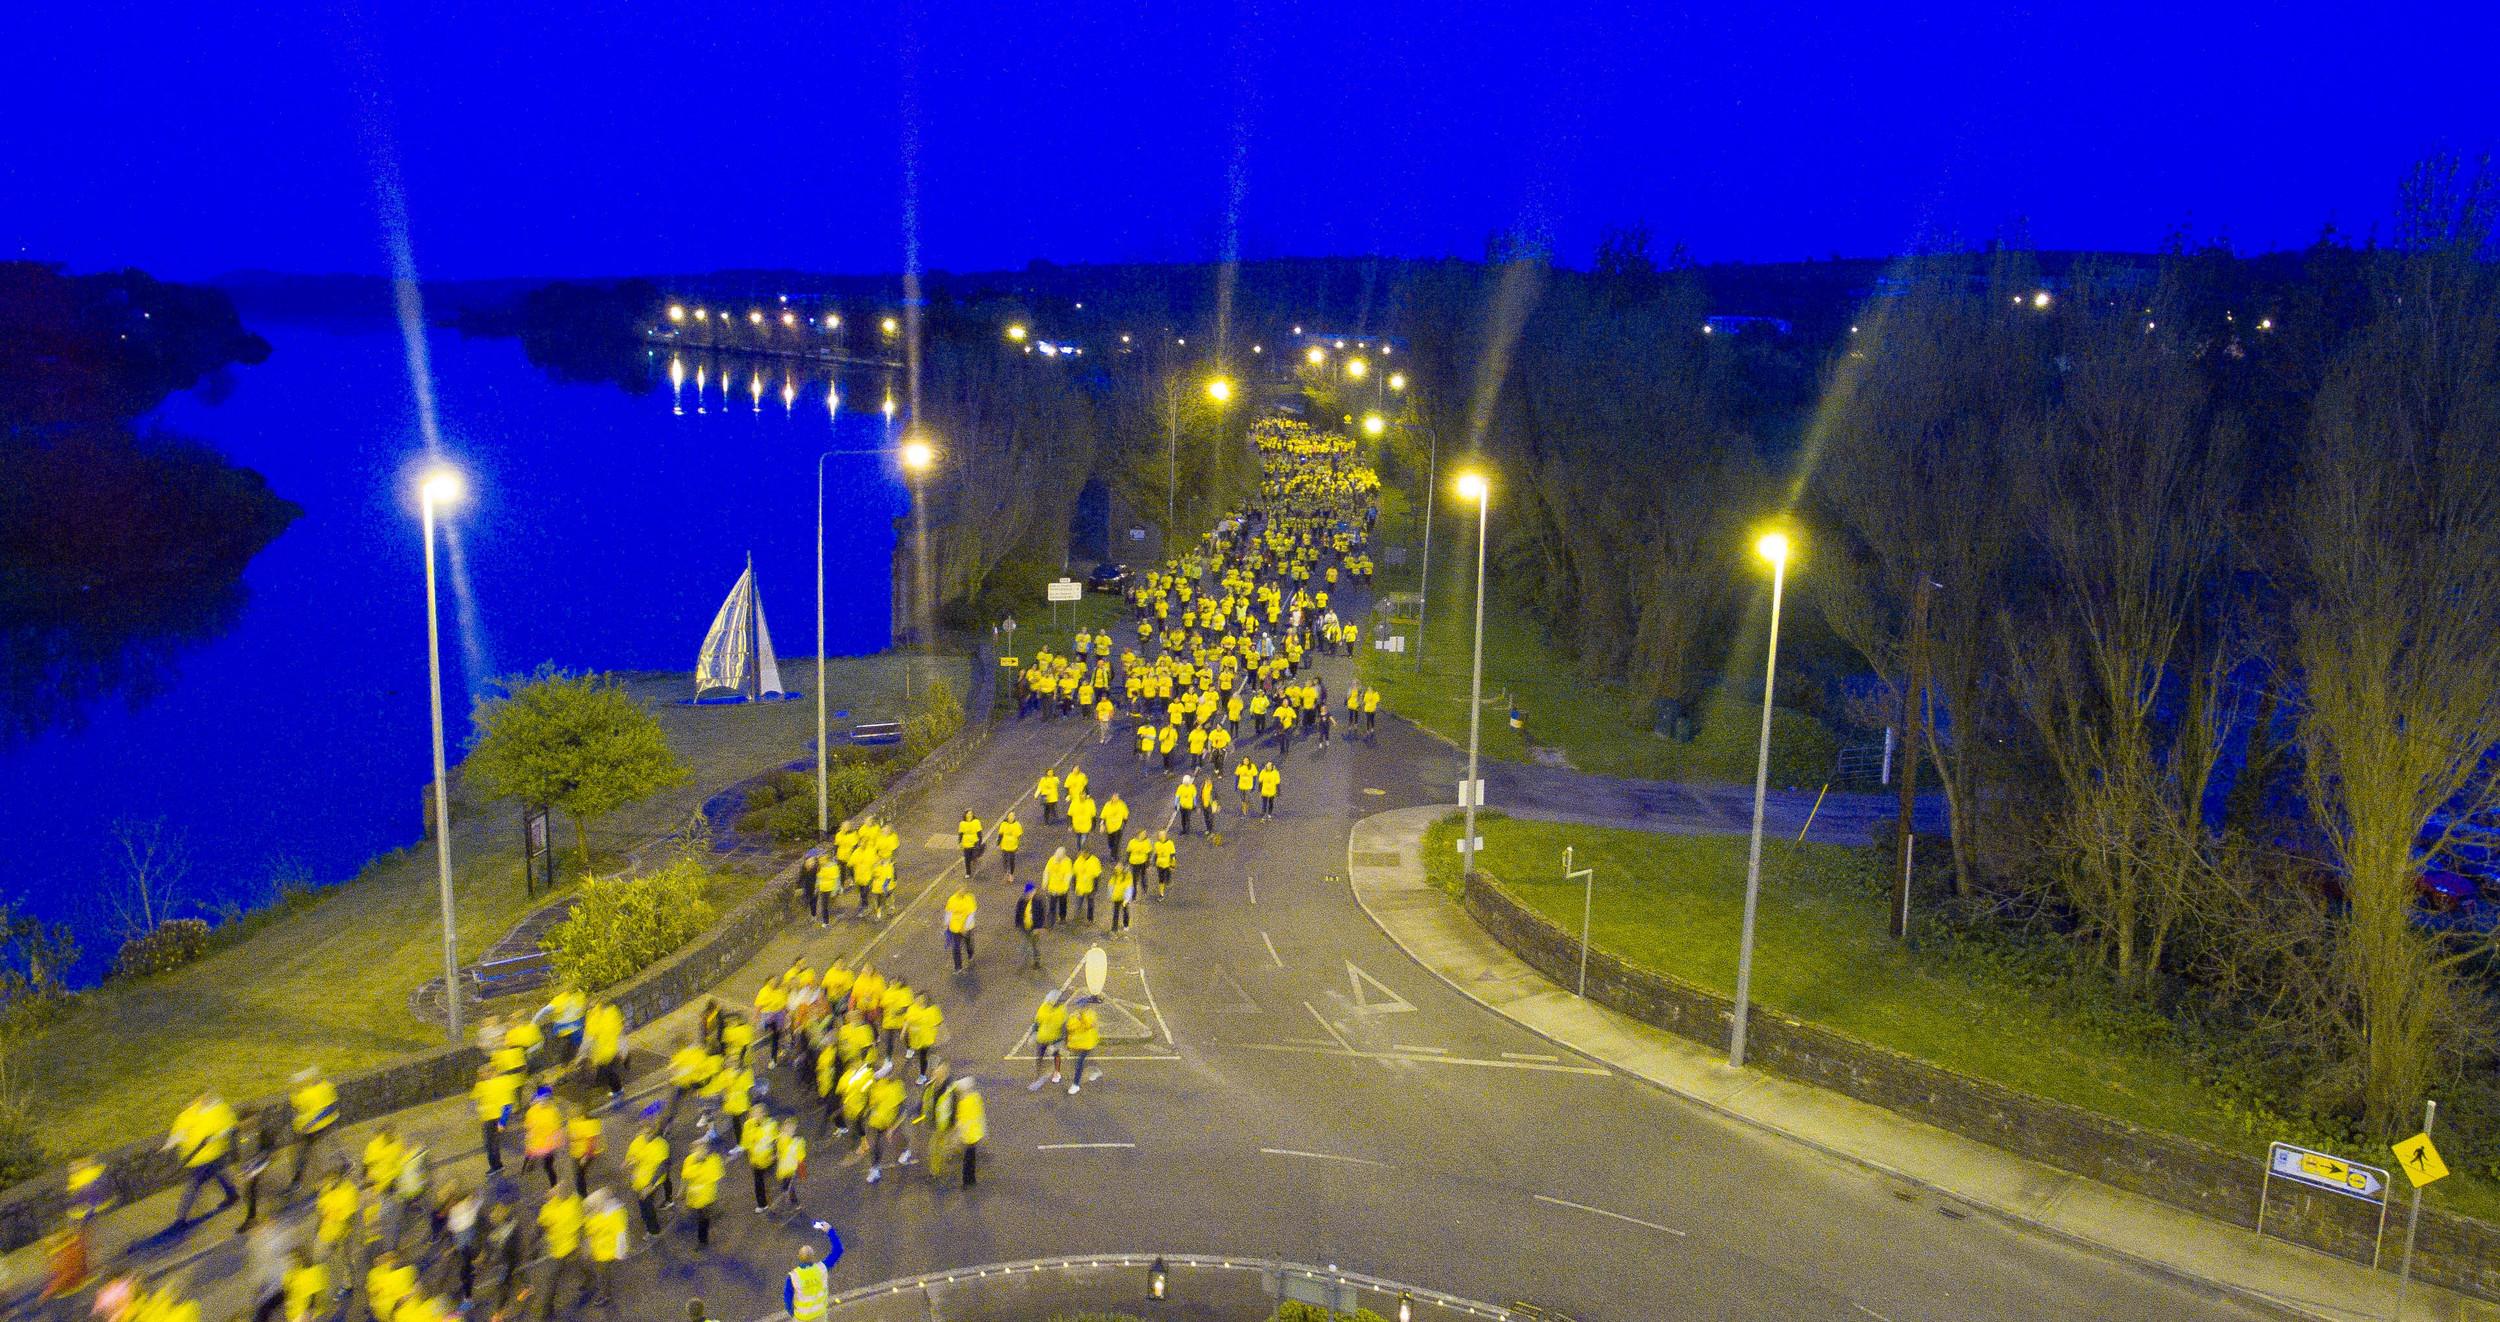 into lighting. 2,500 People Participate In The Inaugural \u201cDarkness Into Light\u201d Walk Aid Of Pieta Lighting